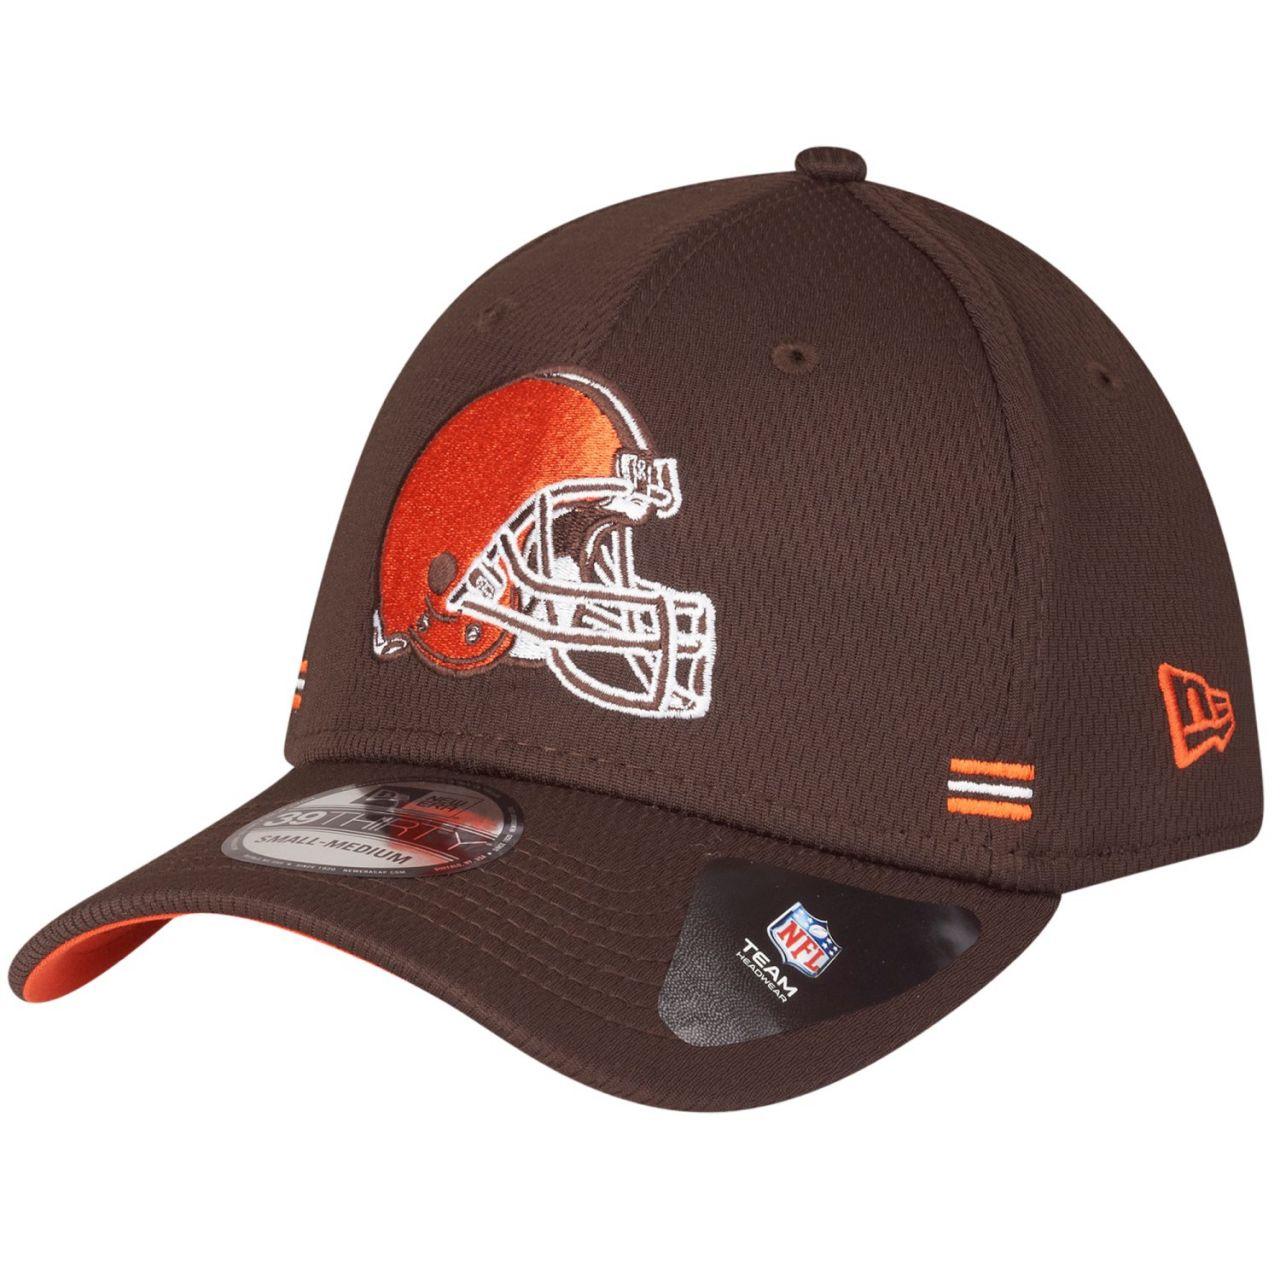 amfoo - New Era 39Thirty Cap - HOMETOWN Cleveland Browns